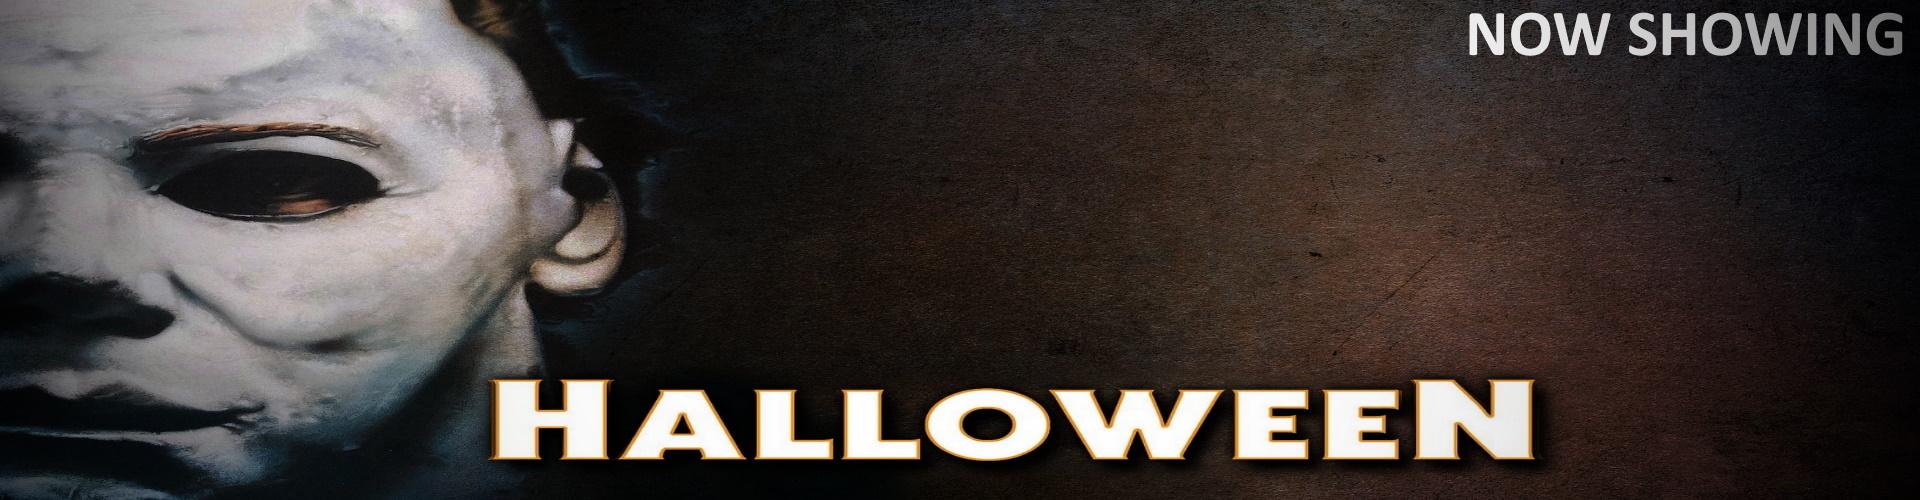 halloweenbanner1978